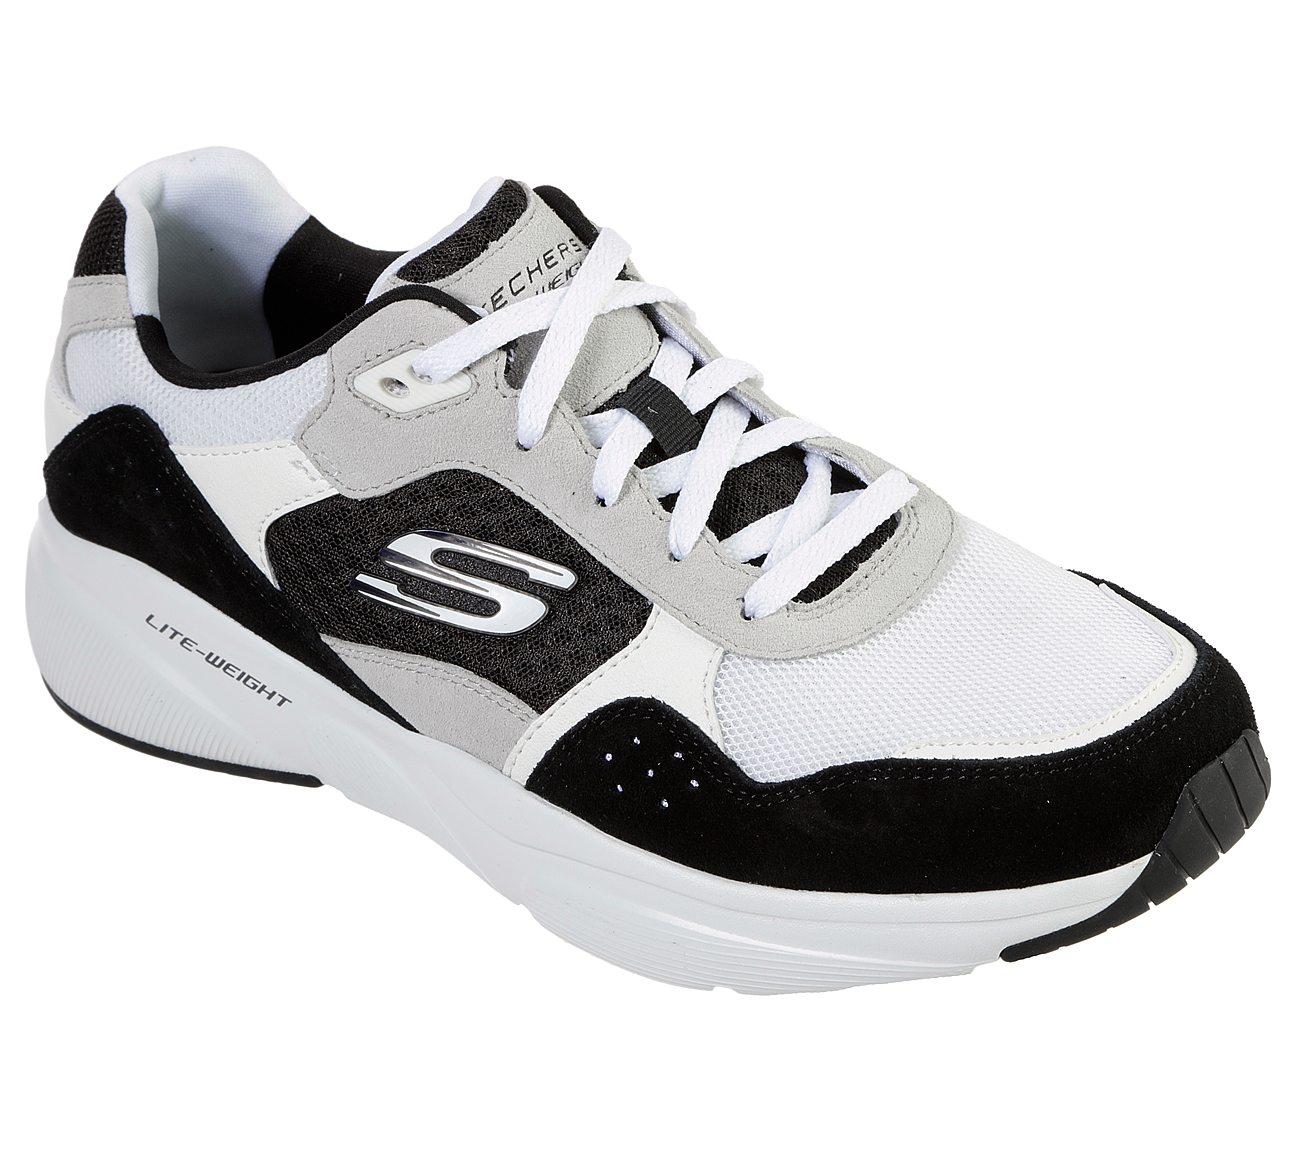 Skechers SKECHERS WOMENS MERIDIAN SNEAKER WHITE BLACK SHOES